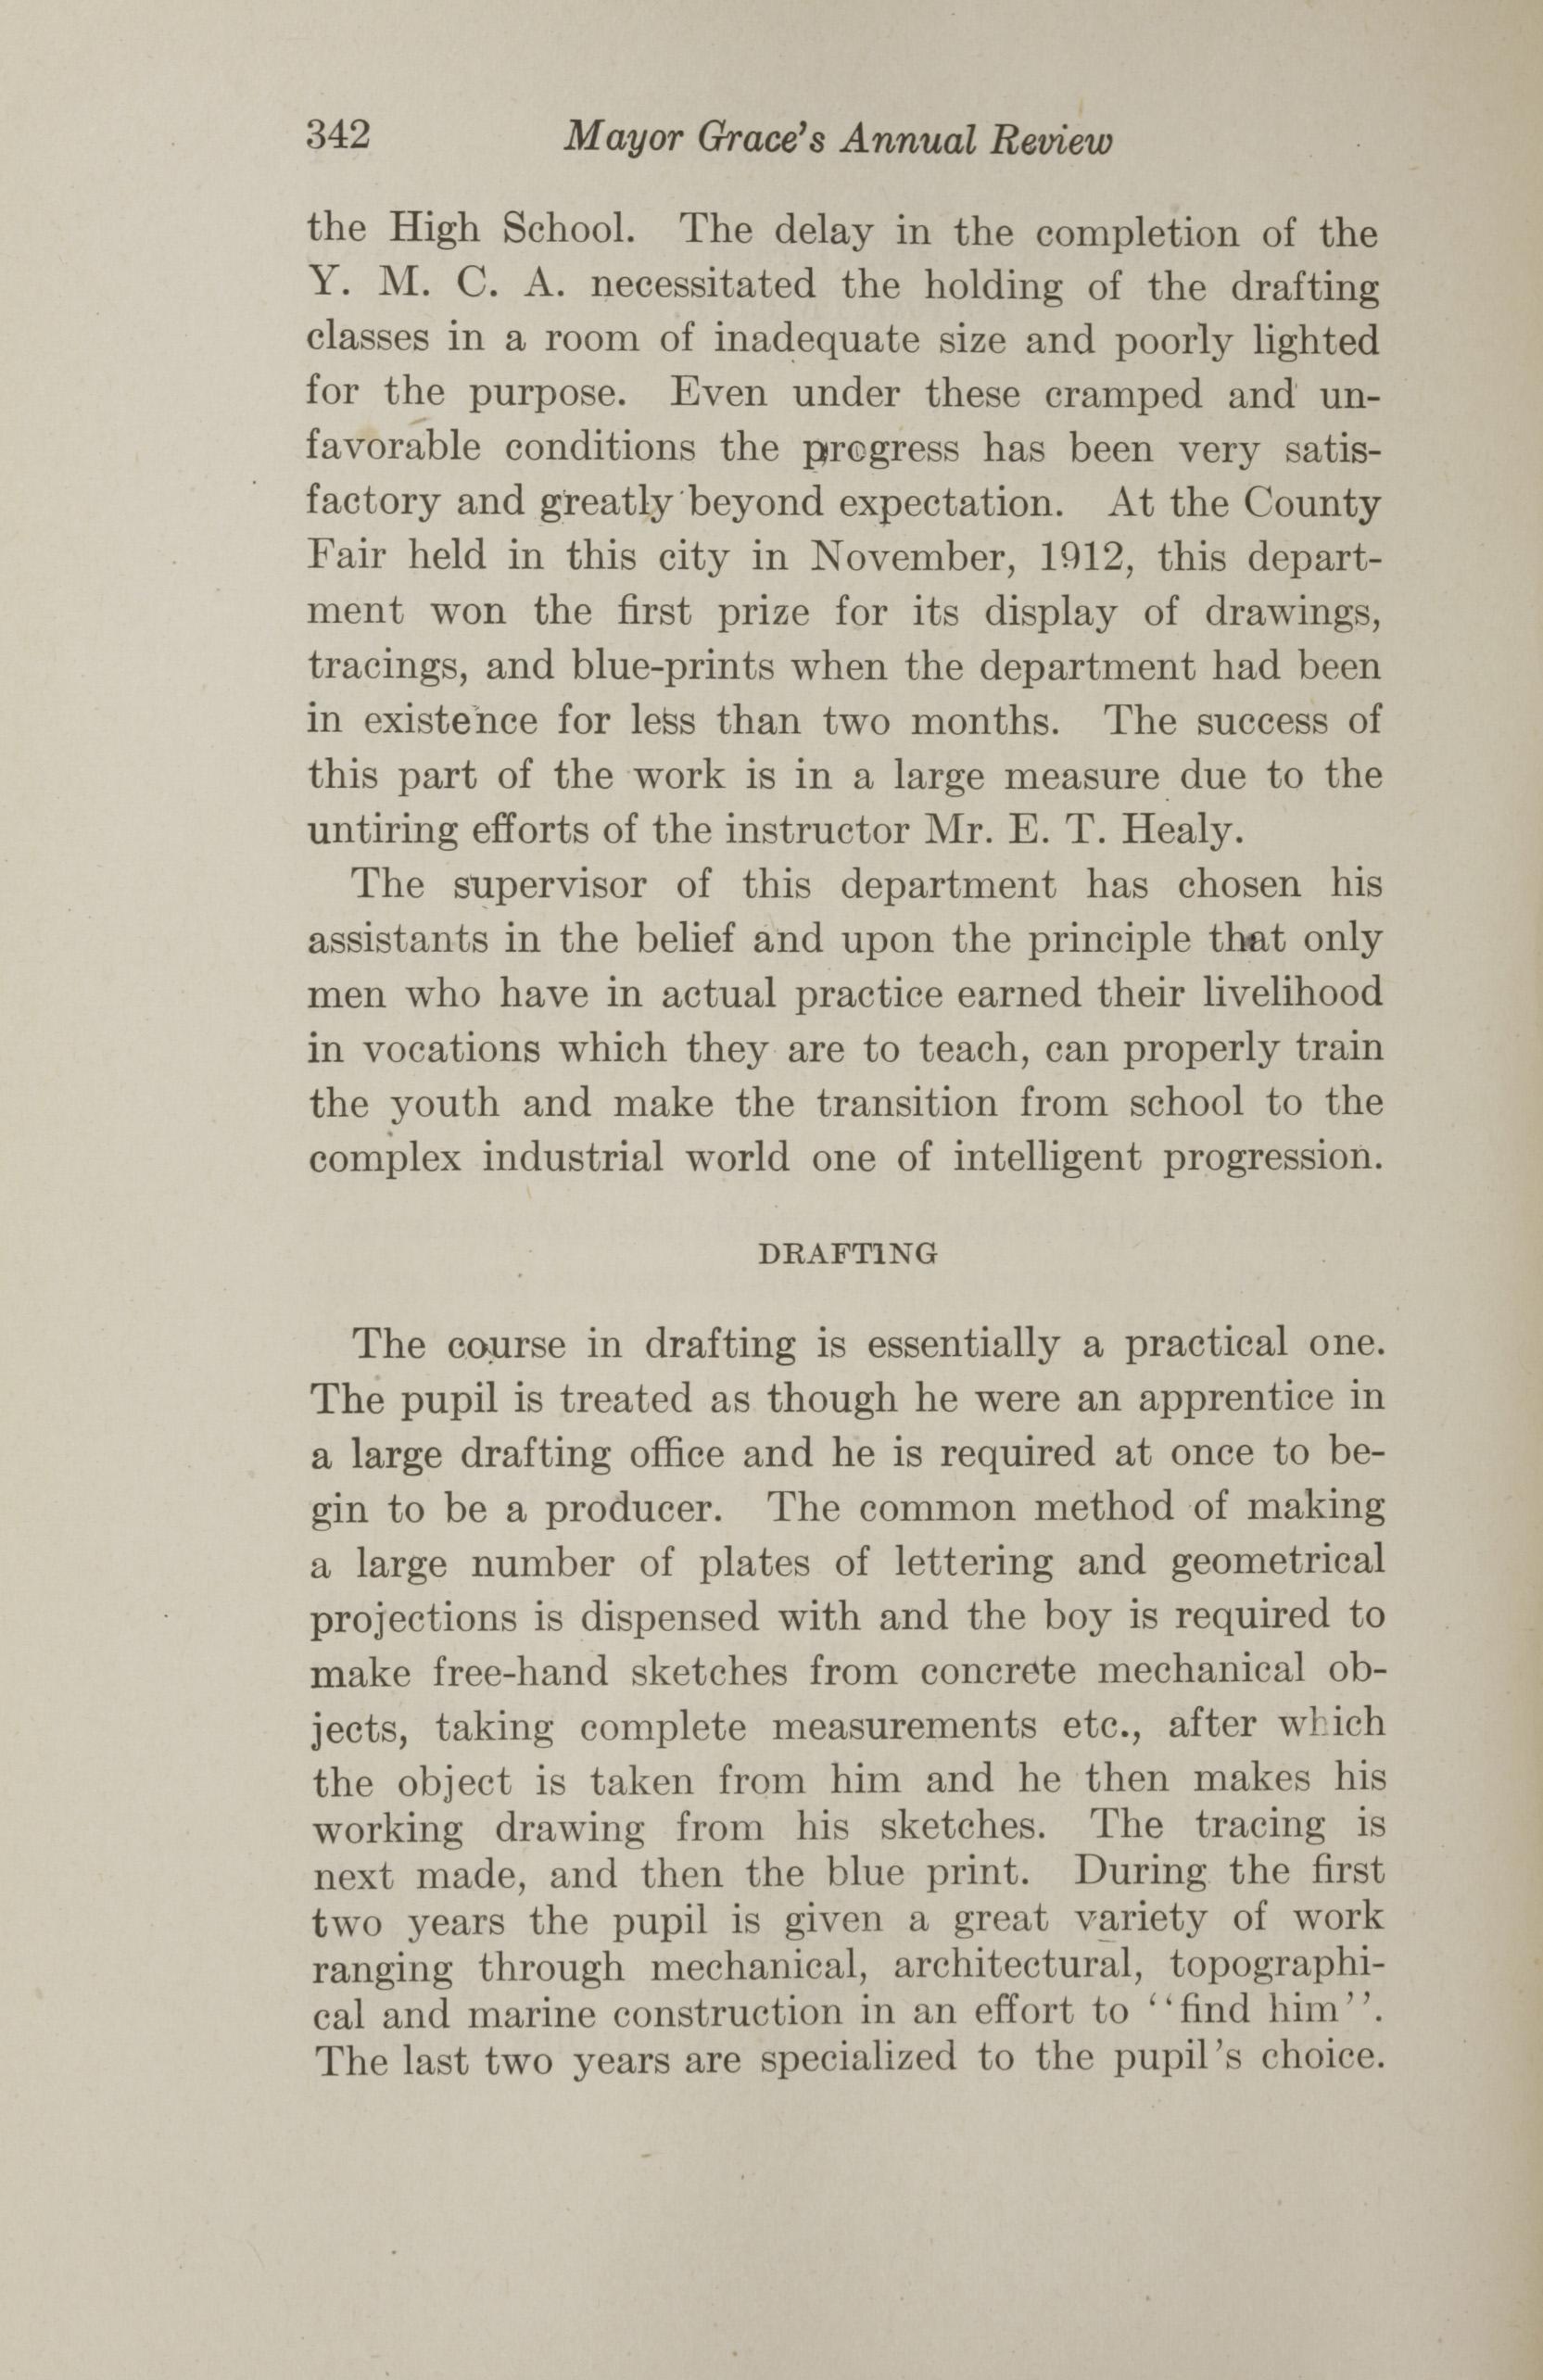 Charleston Yearbook, 1912, page 342